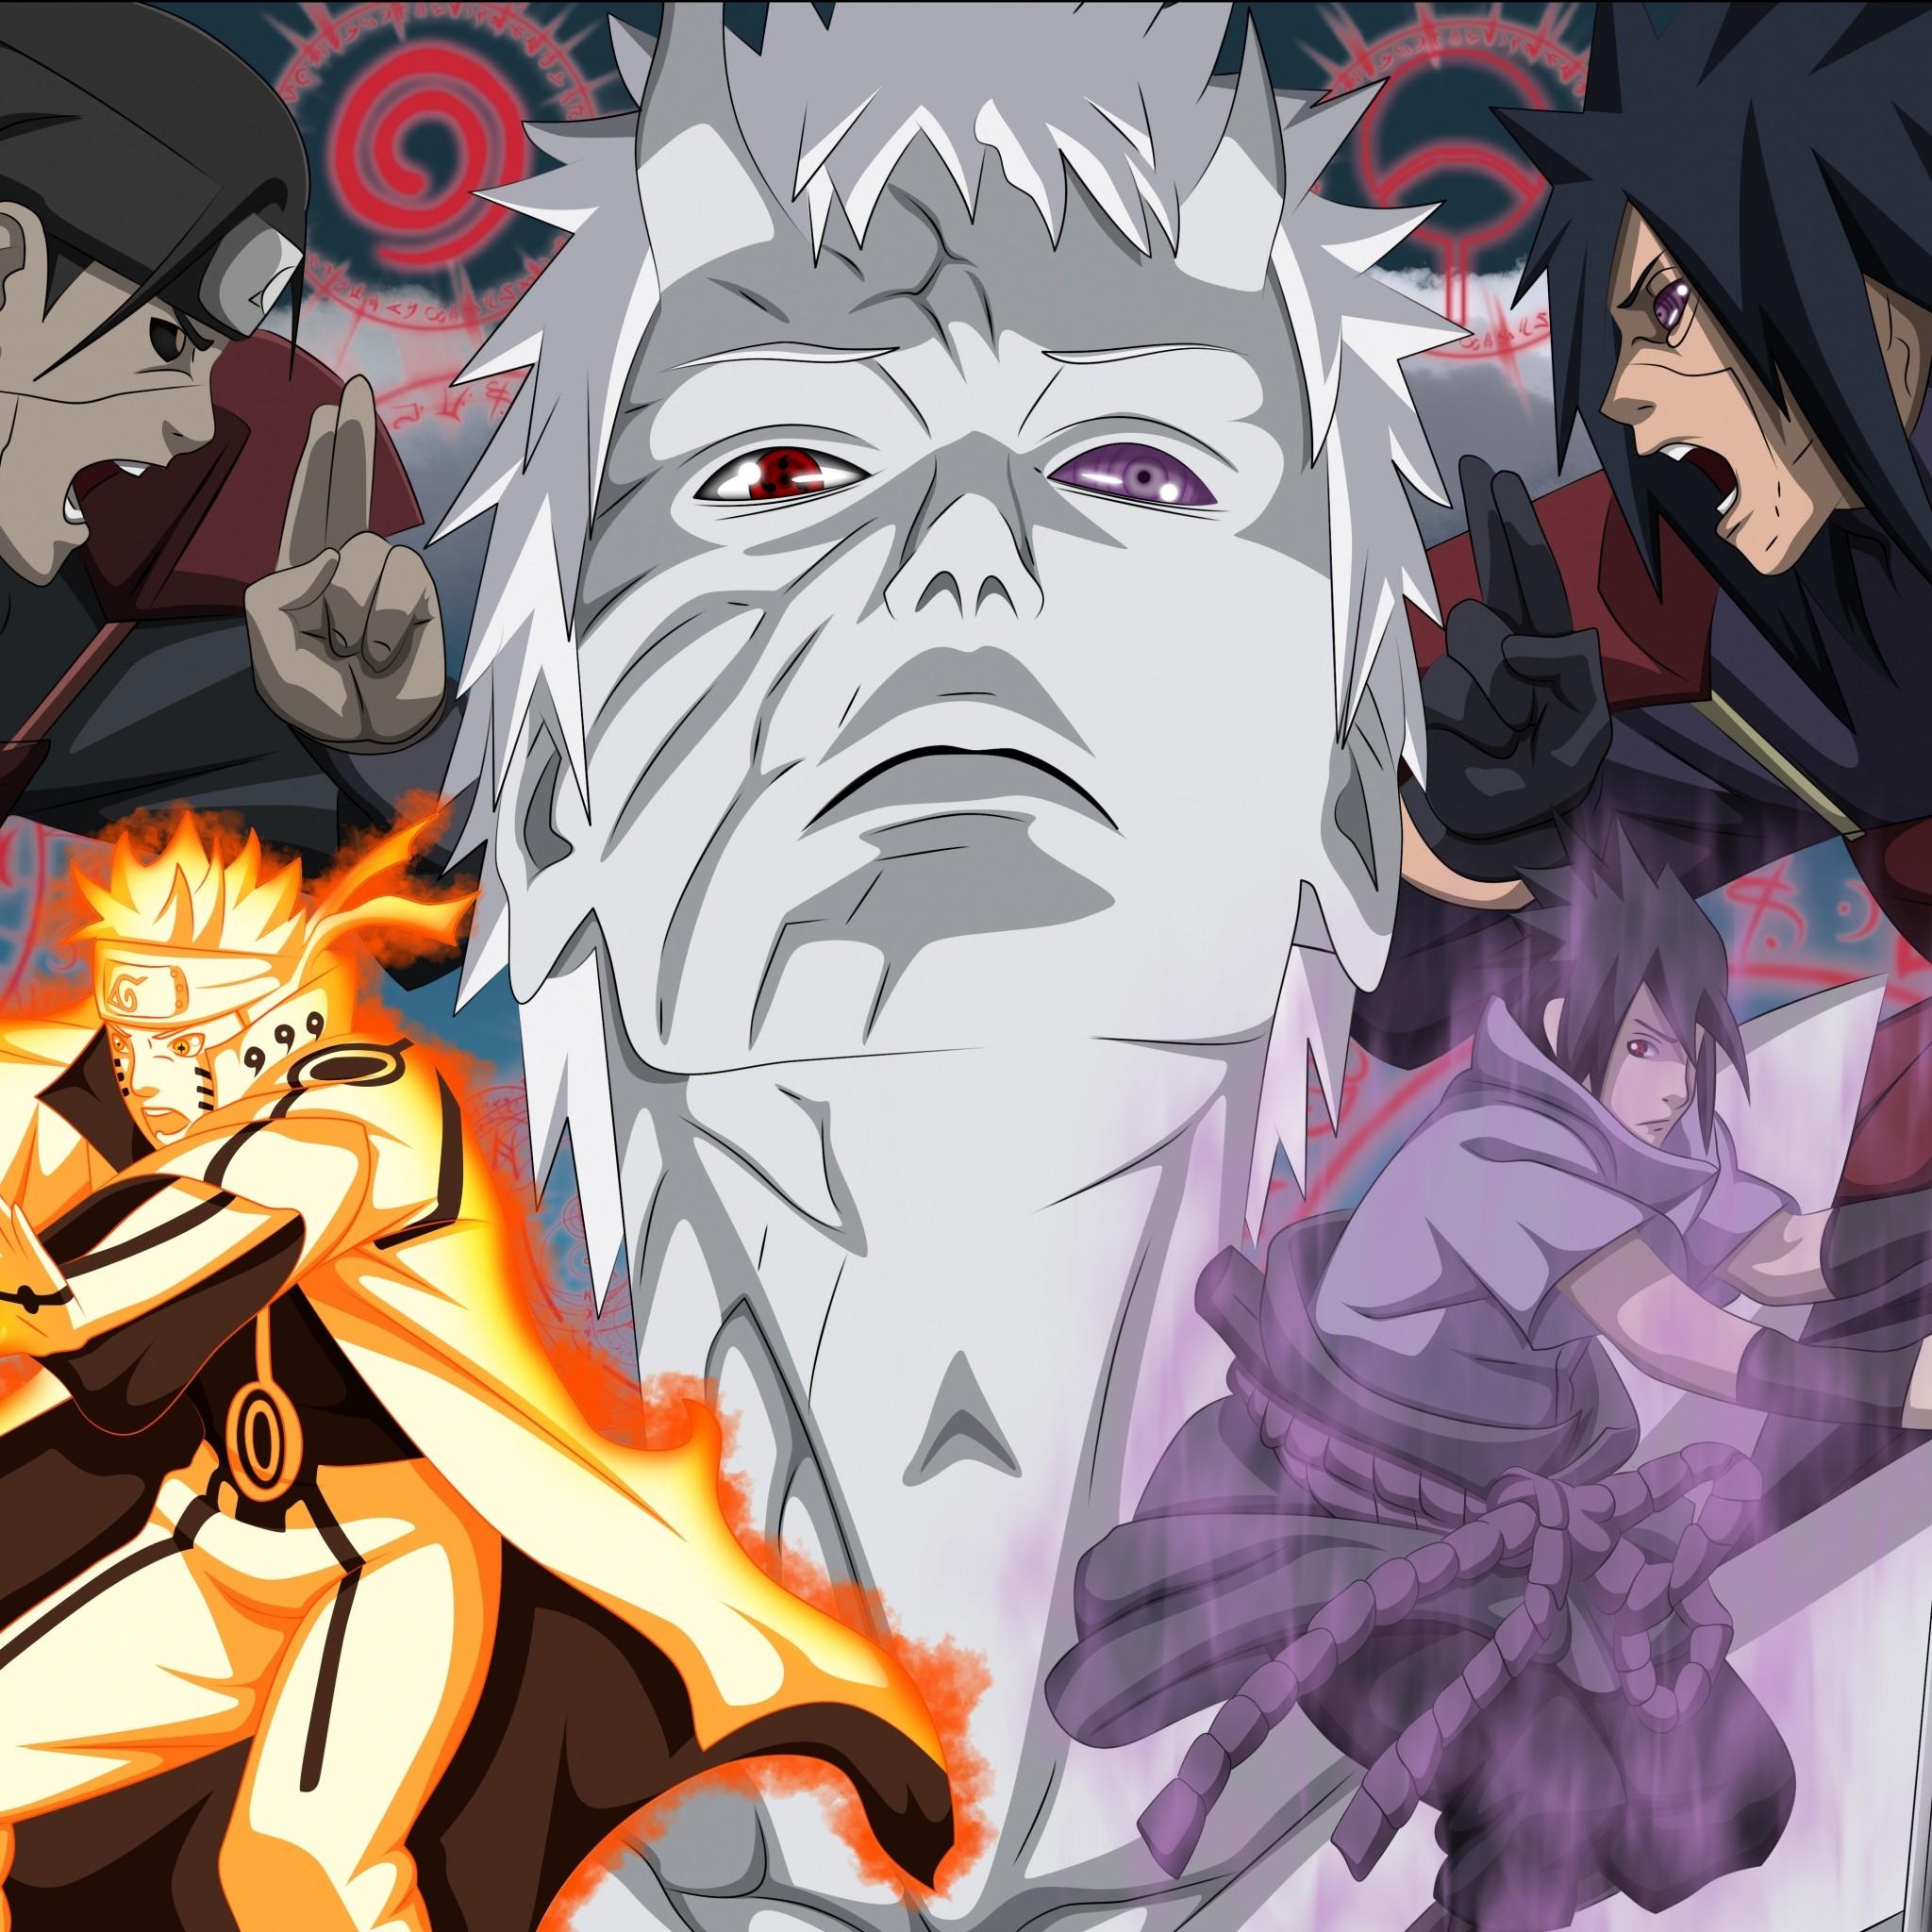 Naruto Hd Wallpaper: Naruto Tobi Wallpaper (58+ Images